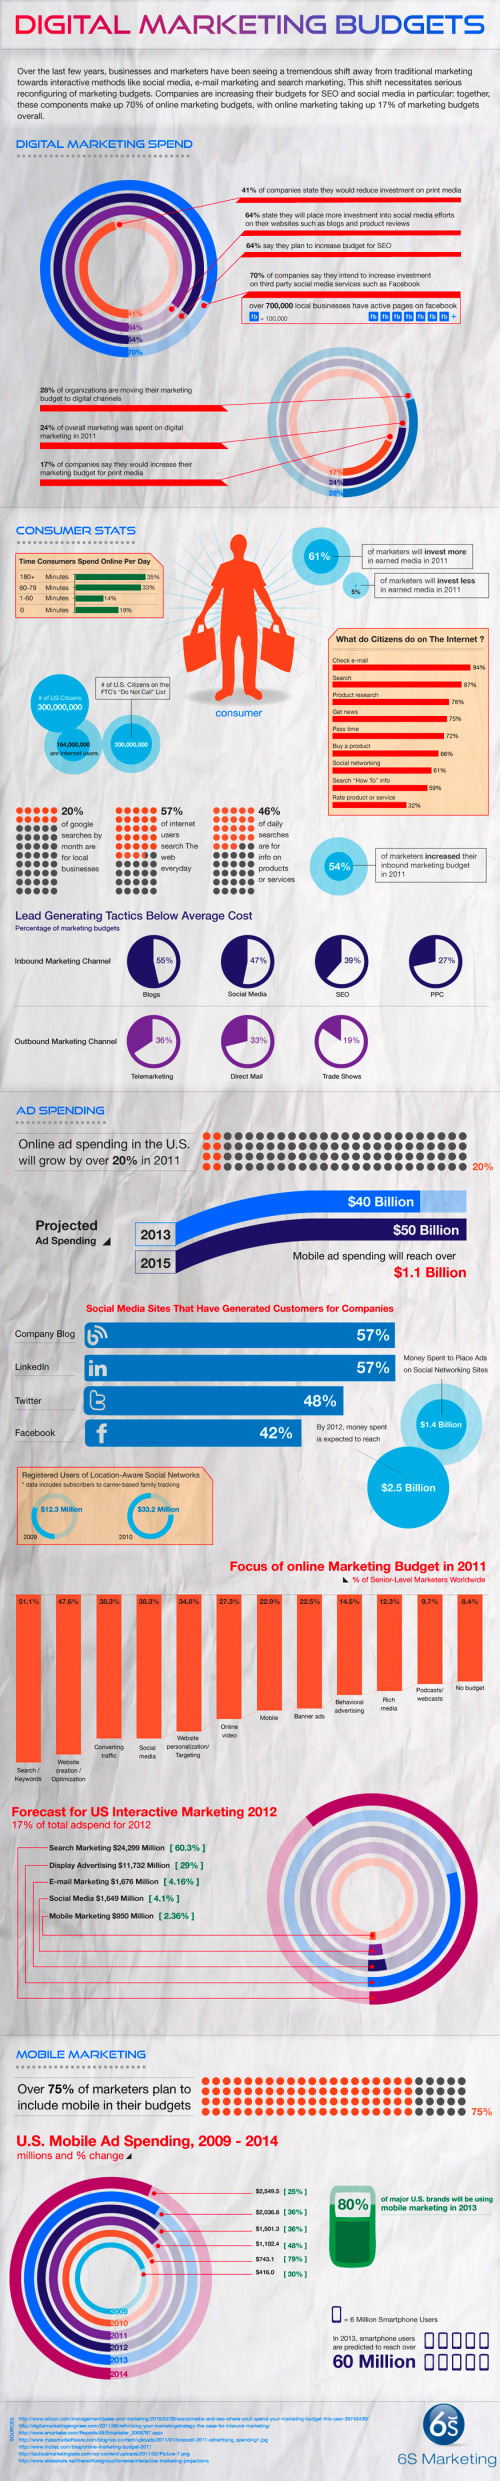 Digital Marketing Budgets infographic